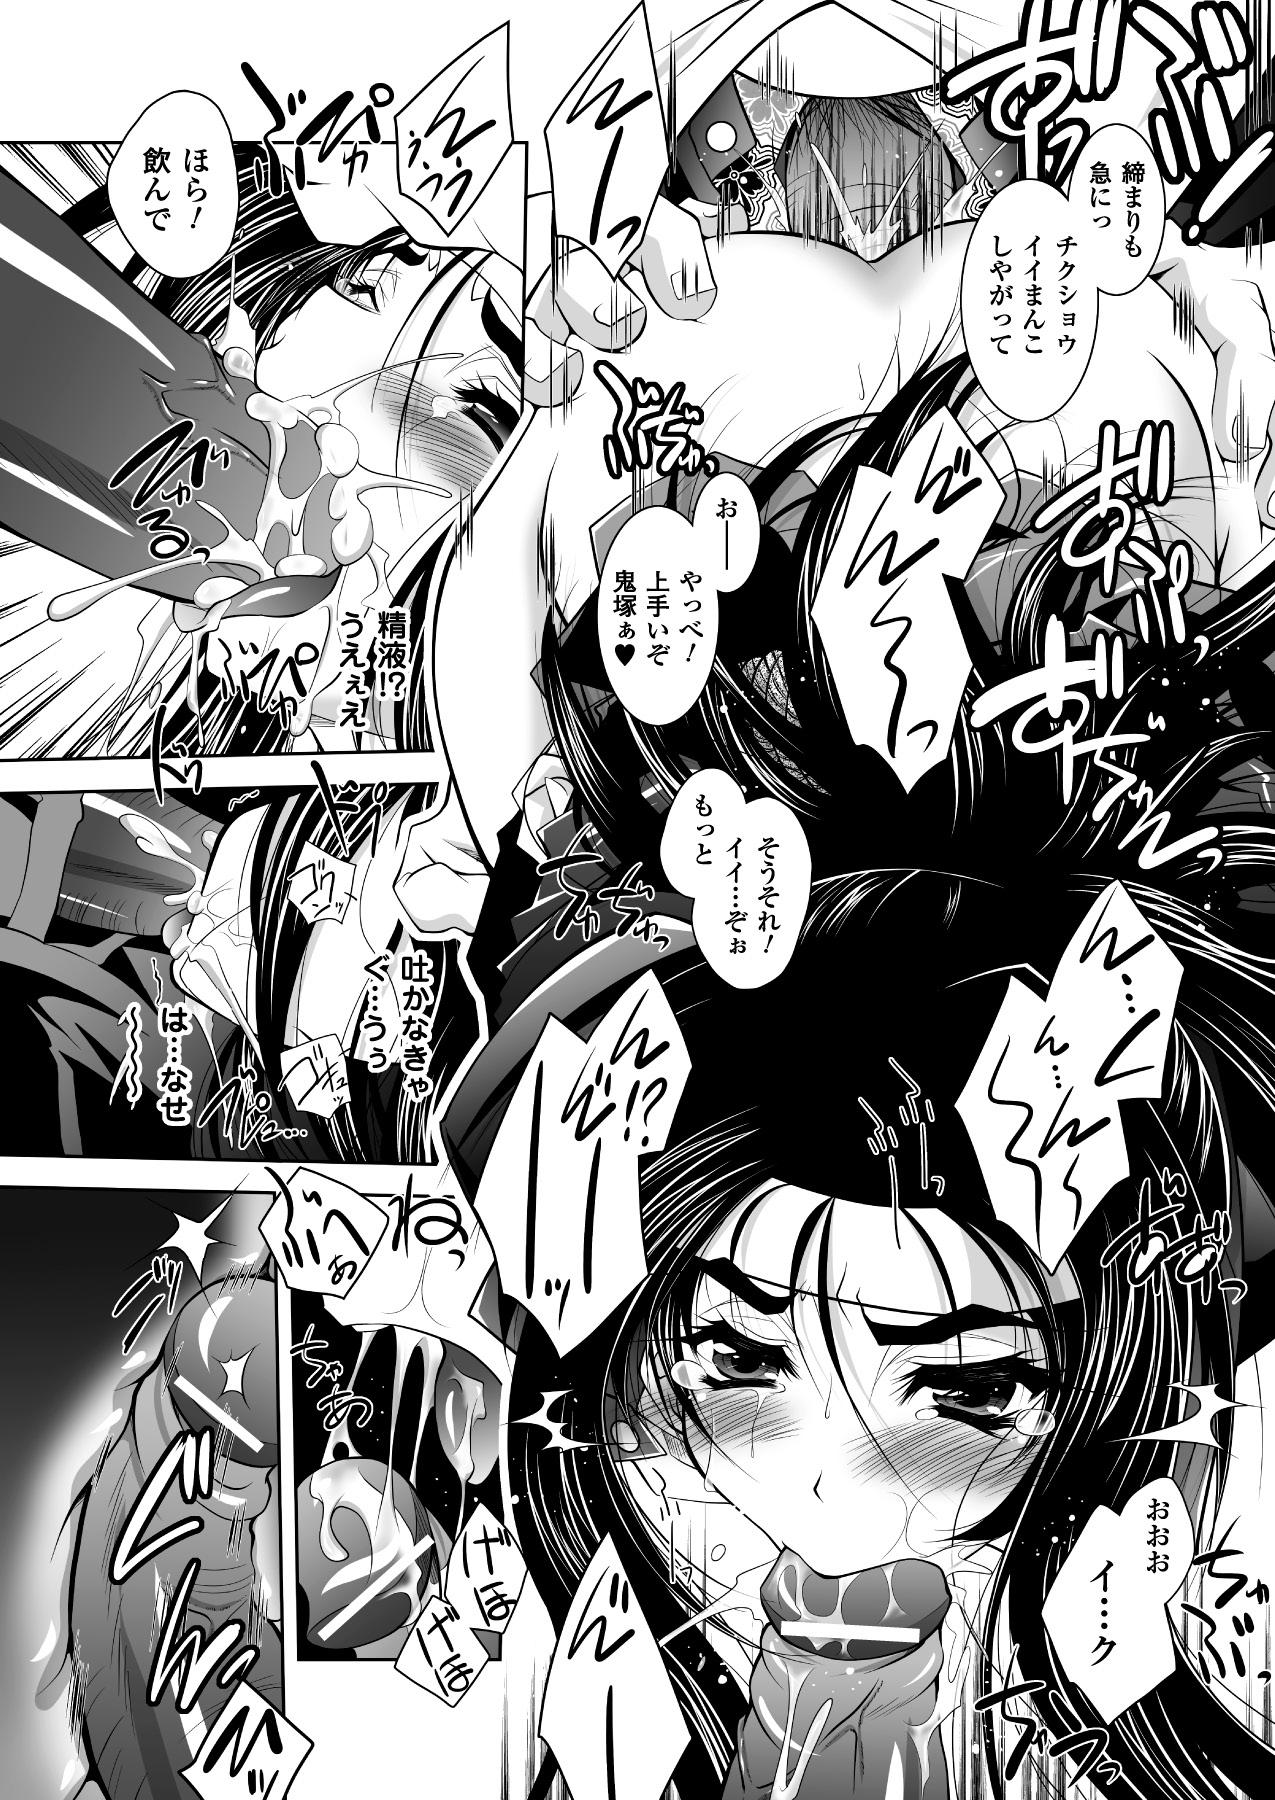 Megami Crisis 10 131